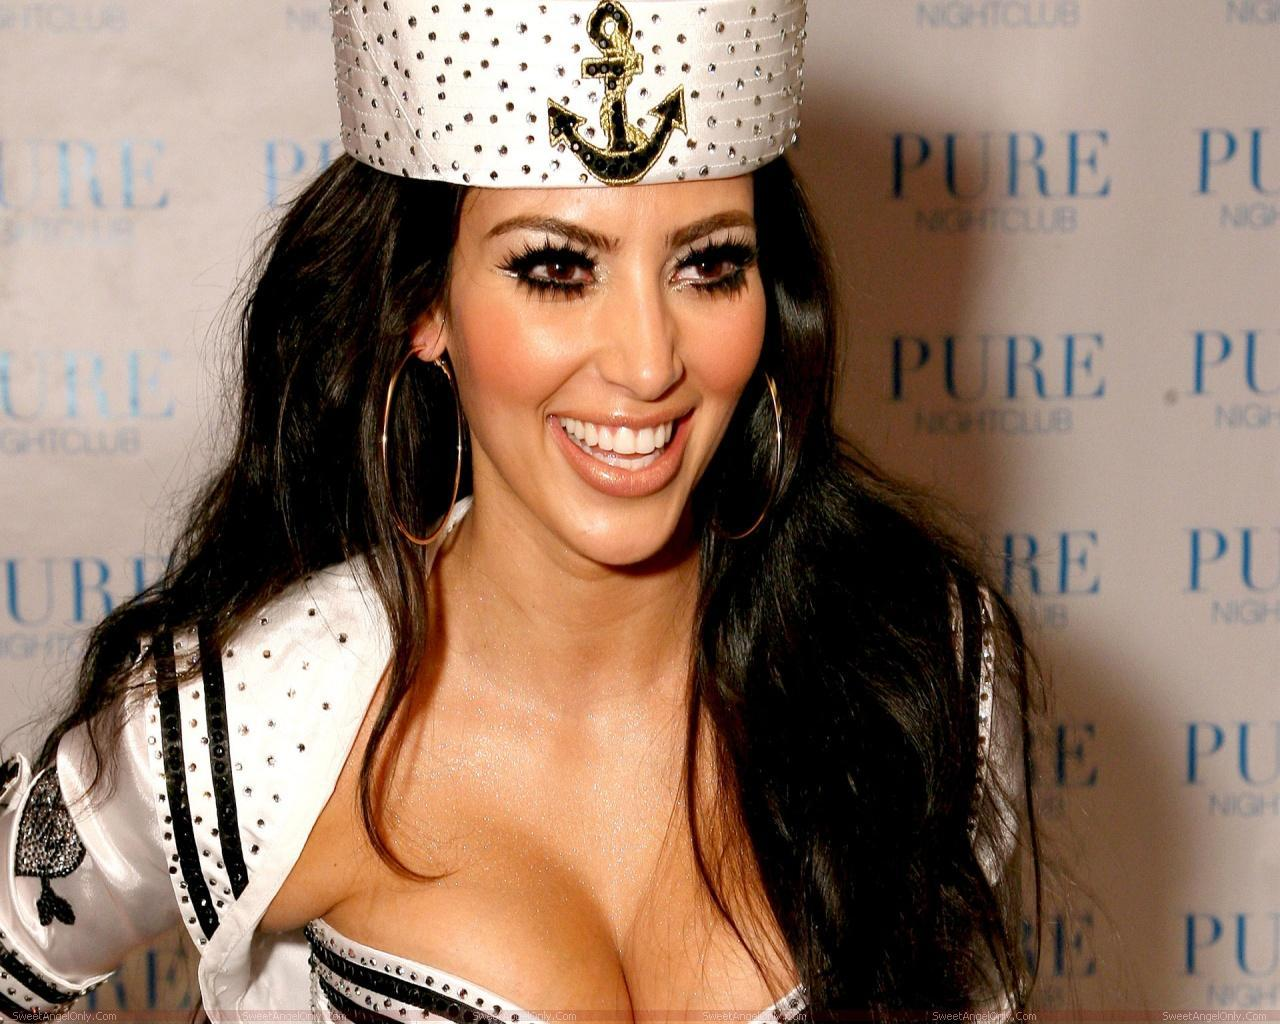 http://1.bp.blogspot.com/-ACsrxxFErXg/T4AShx64NII/AAAAAAAAA2c/qeayhGnejTY/s1600/kim+kardashian+hot+4.jpg